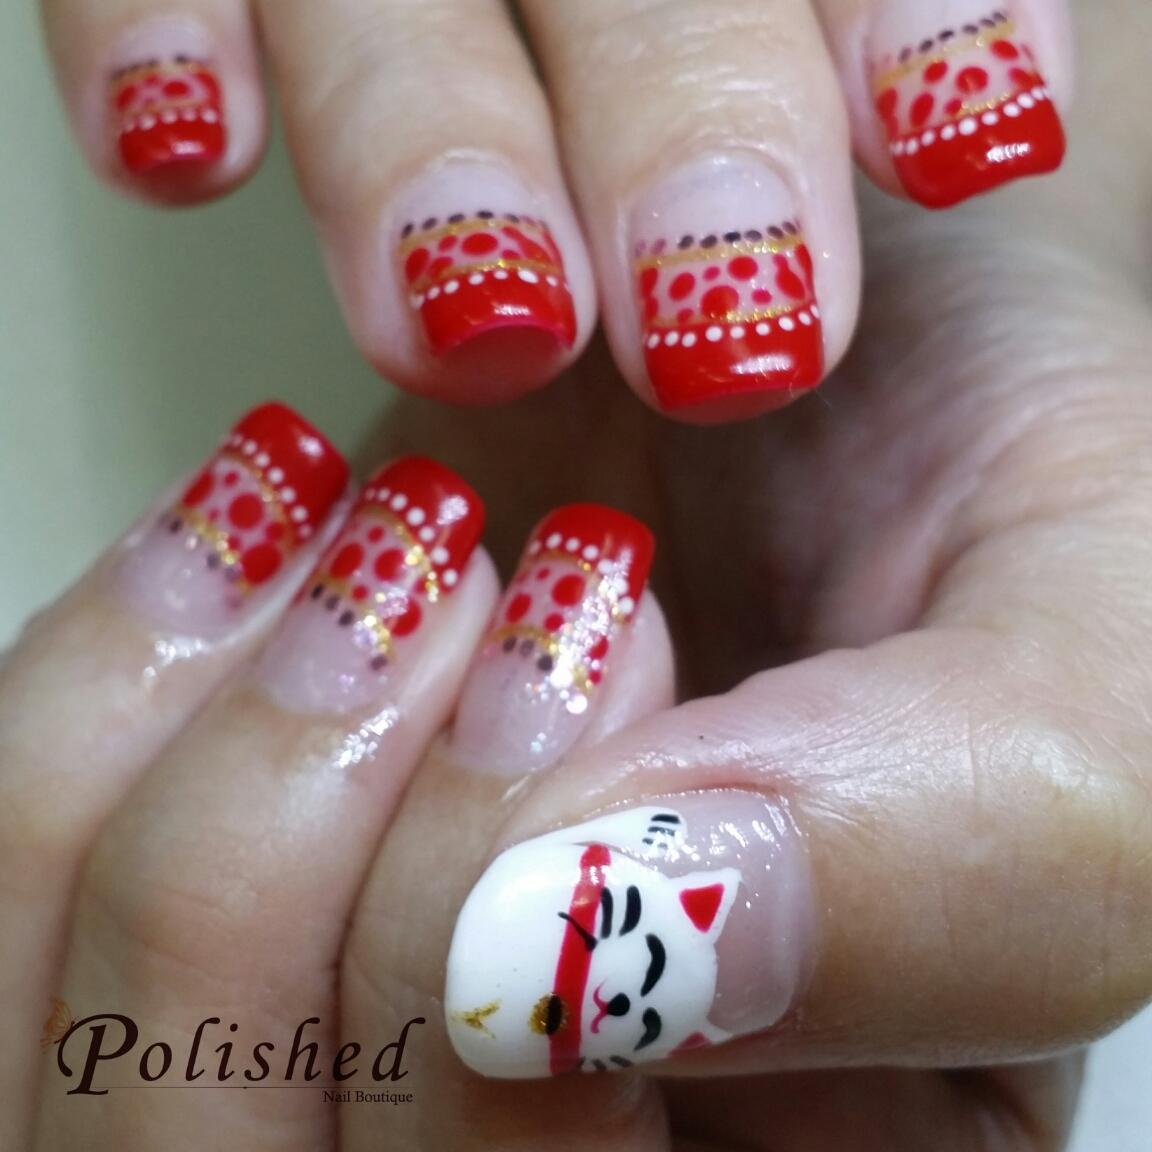 Cny Nail Art Design 2014 Nails Gallery